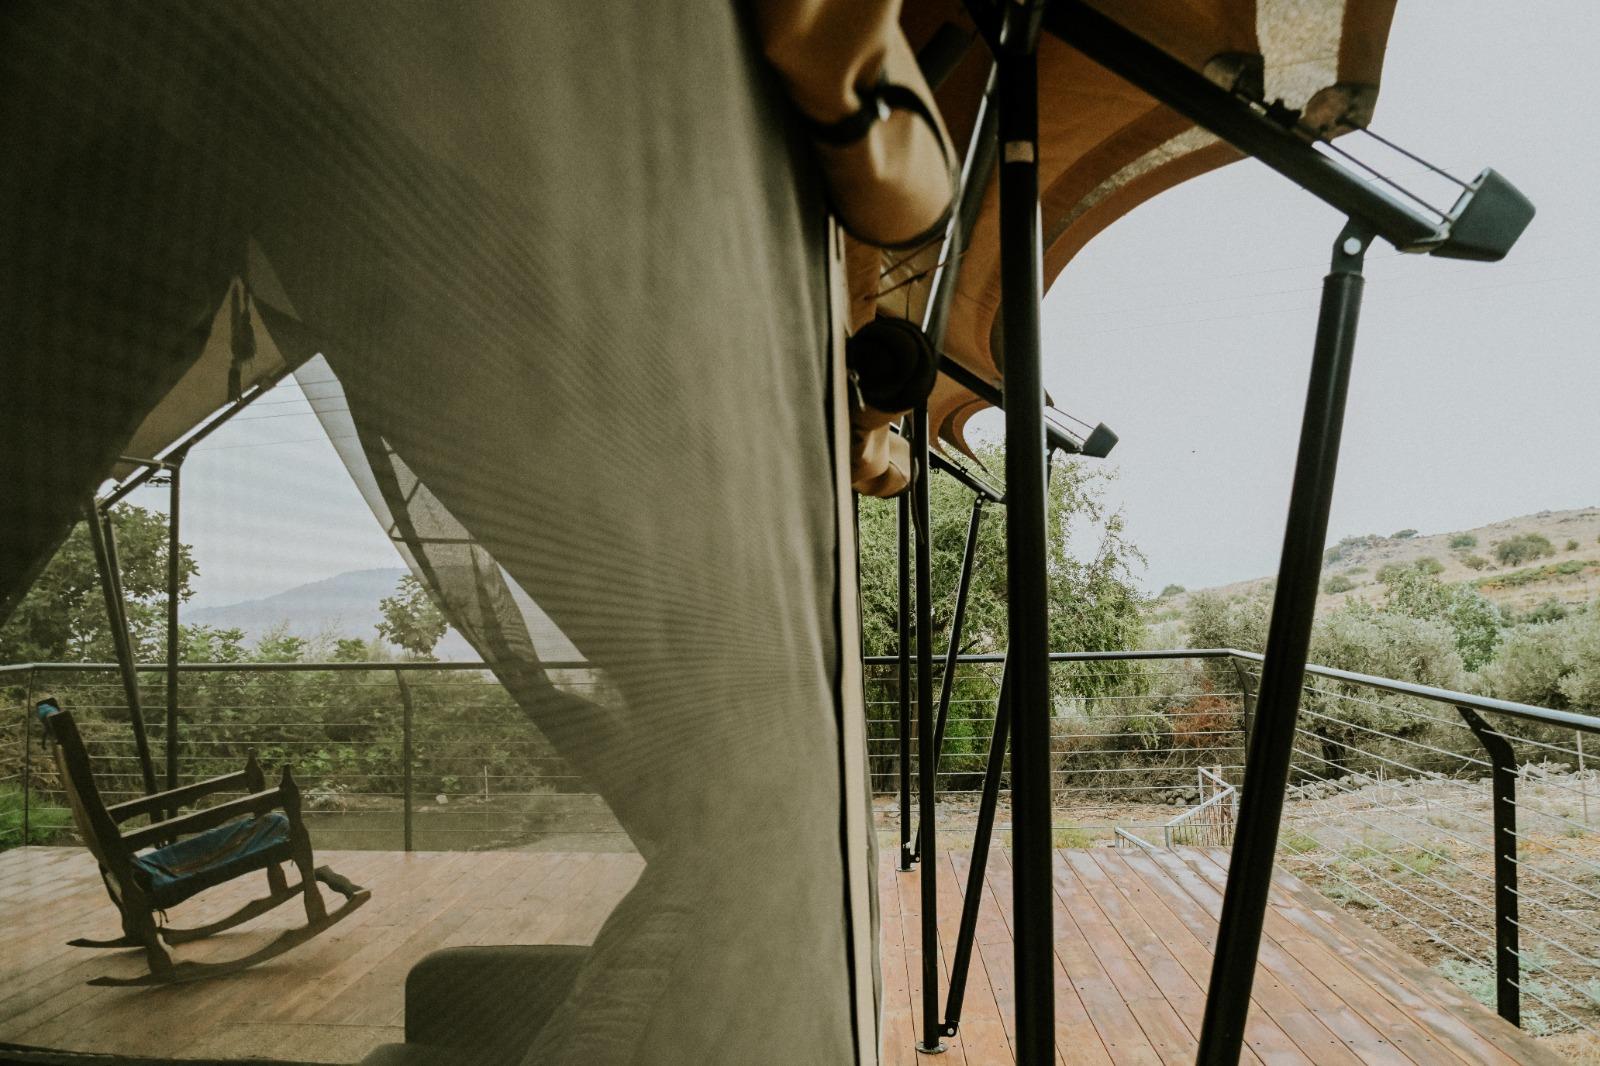 Hostal de la Luz Glamping Tent